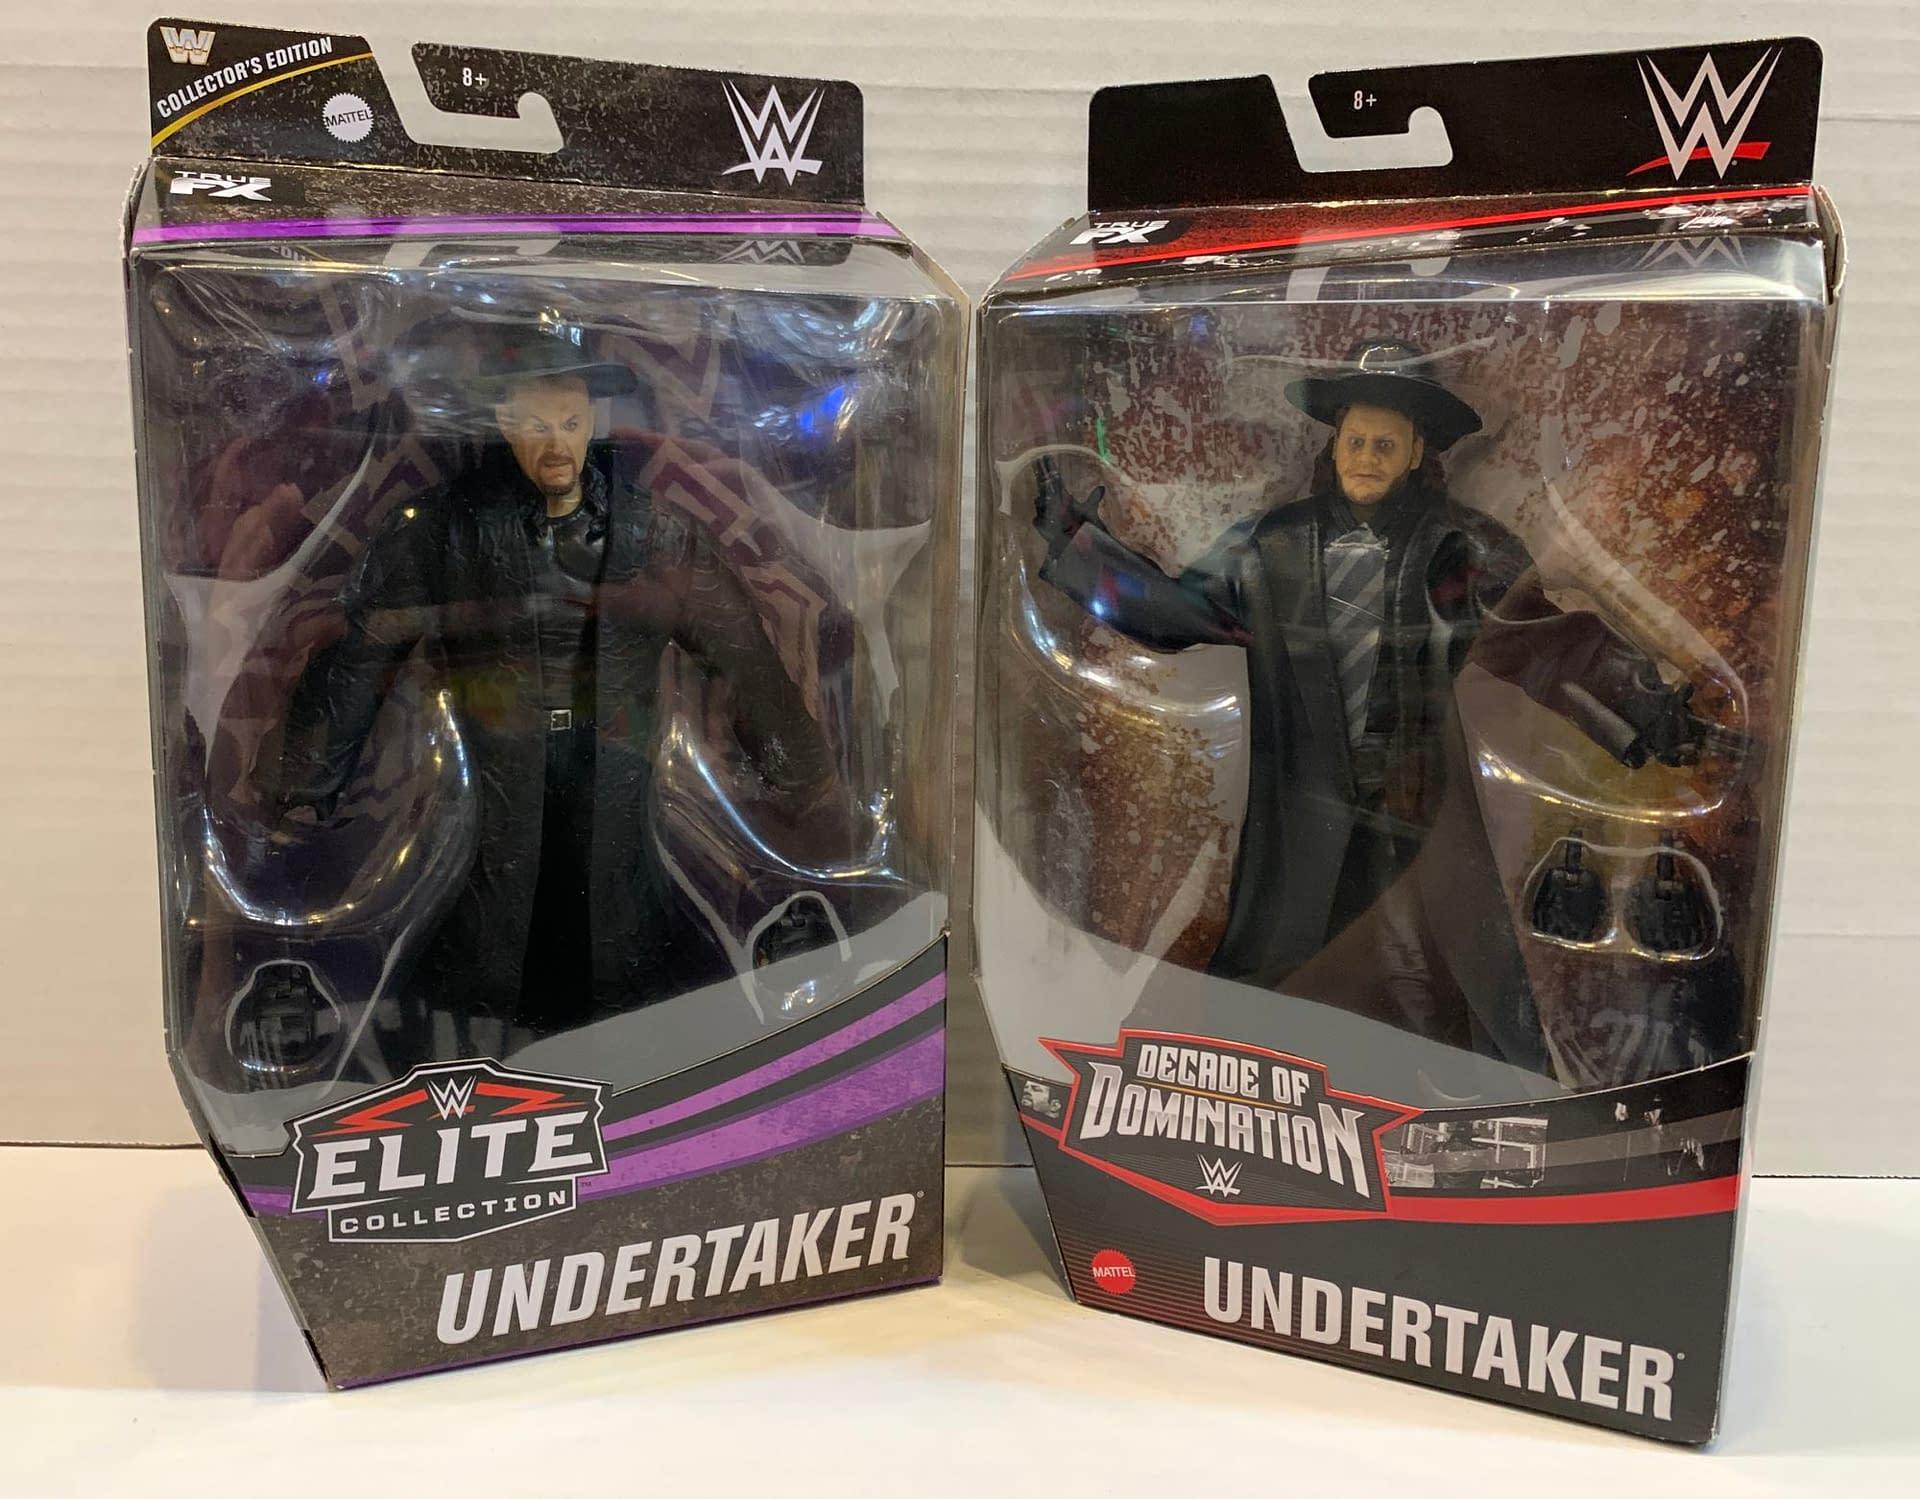 *PREORDER* NEW MATTEL WWE ELITE UNDERTAKER DECADE OF DOMINATION FIGURE LOOK